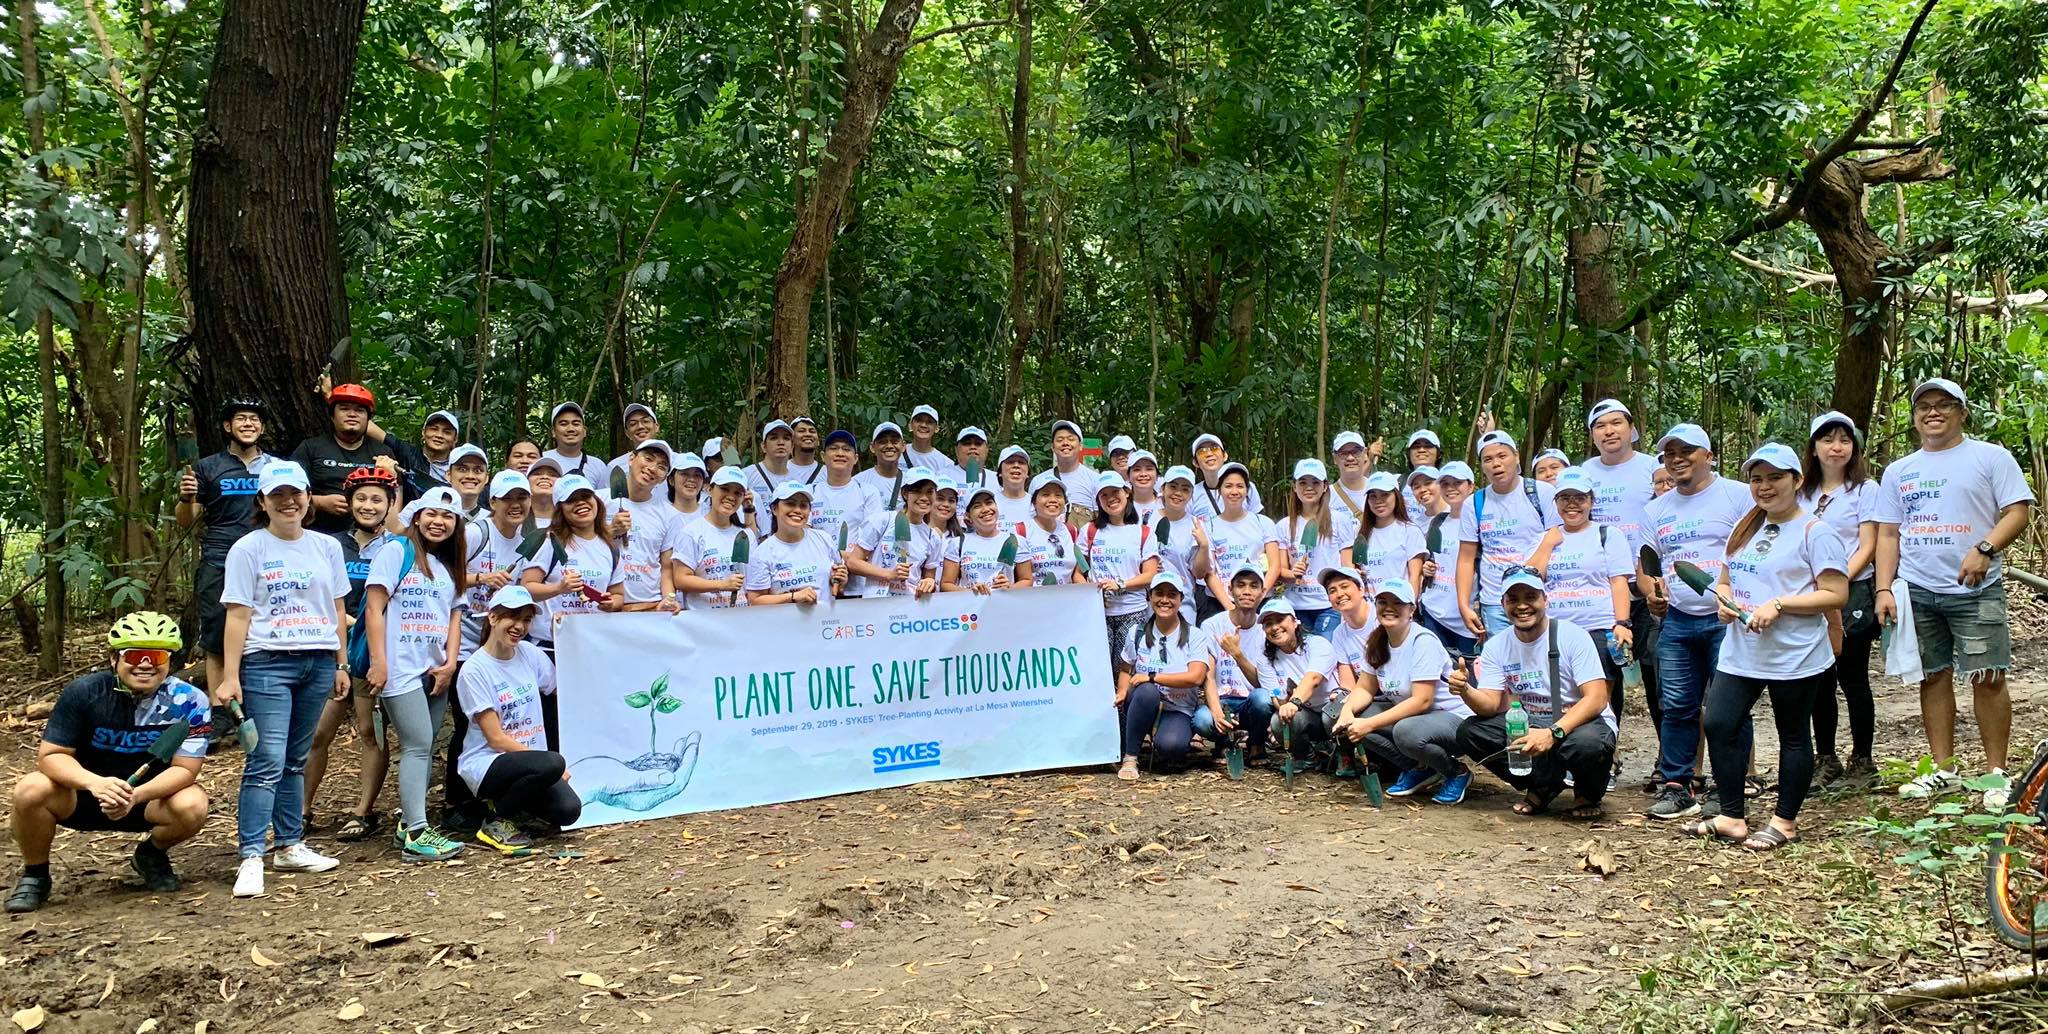 SYKES' global workforce promotes environmental sustainability